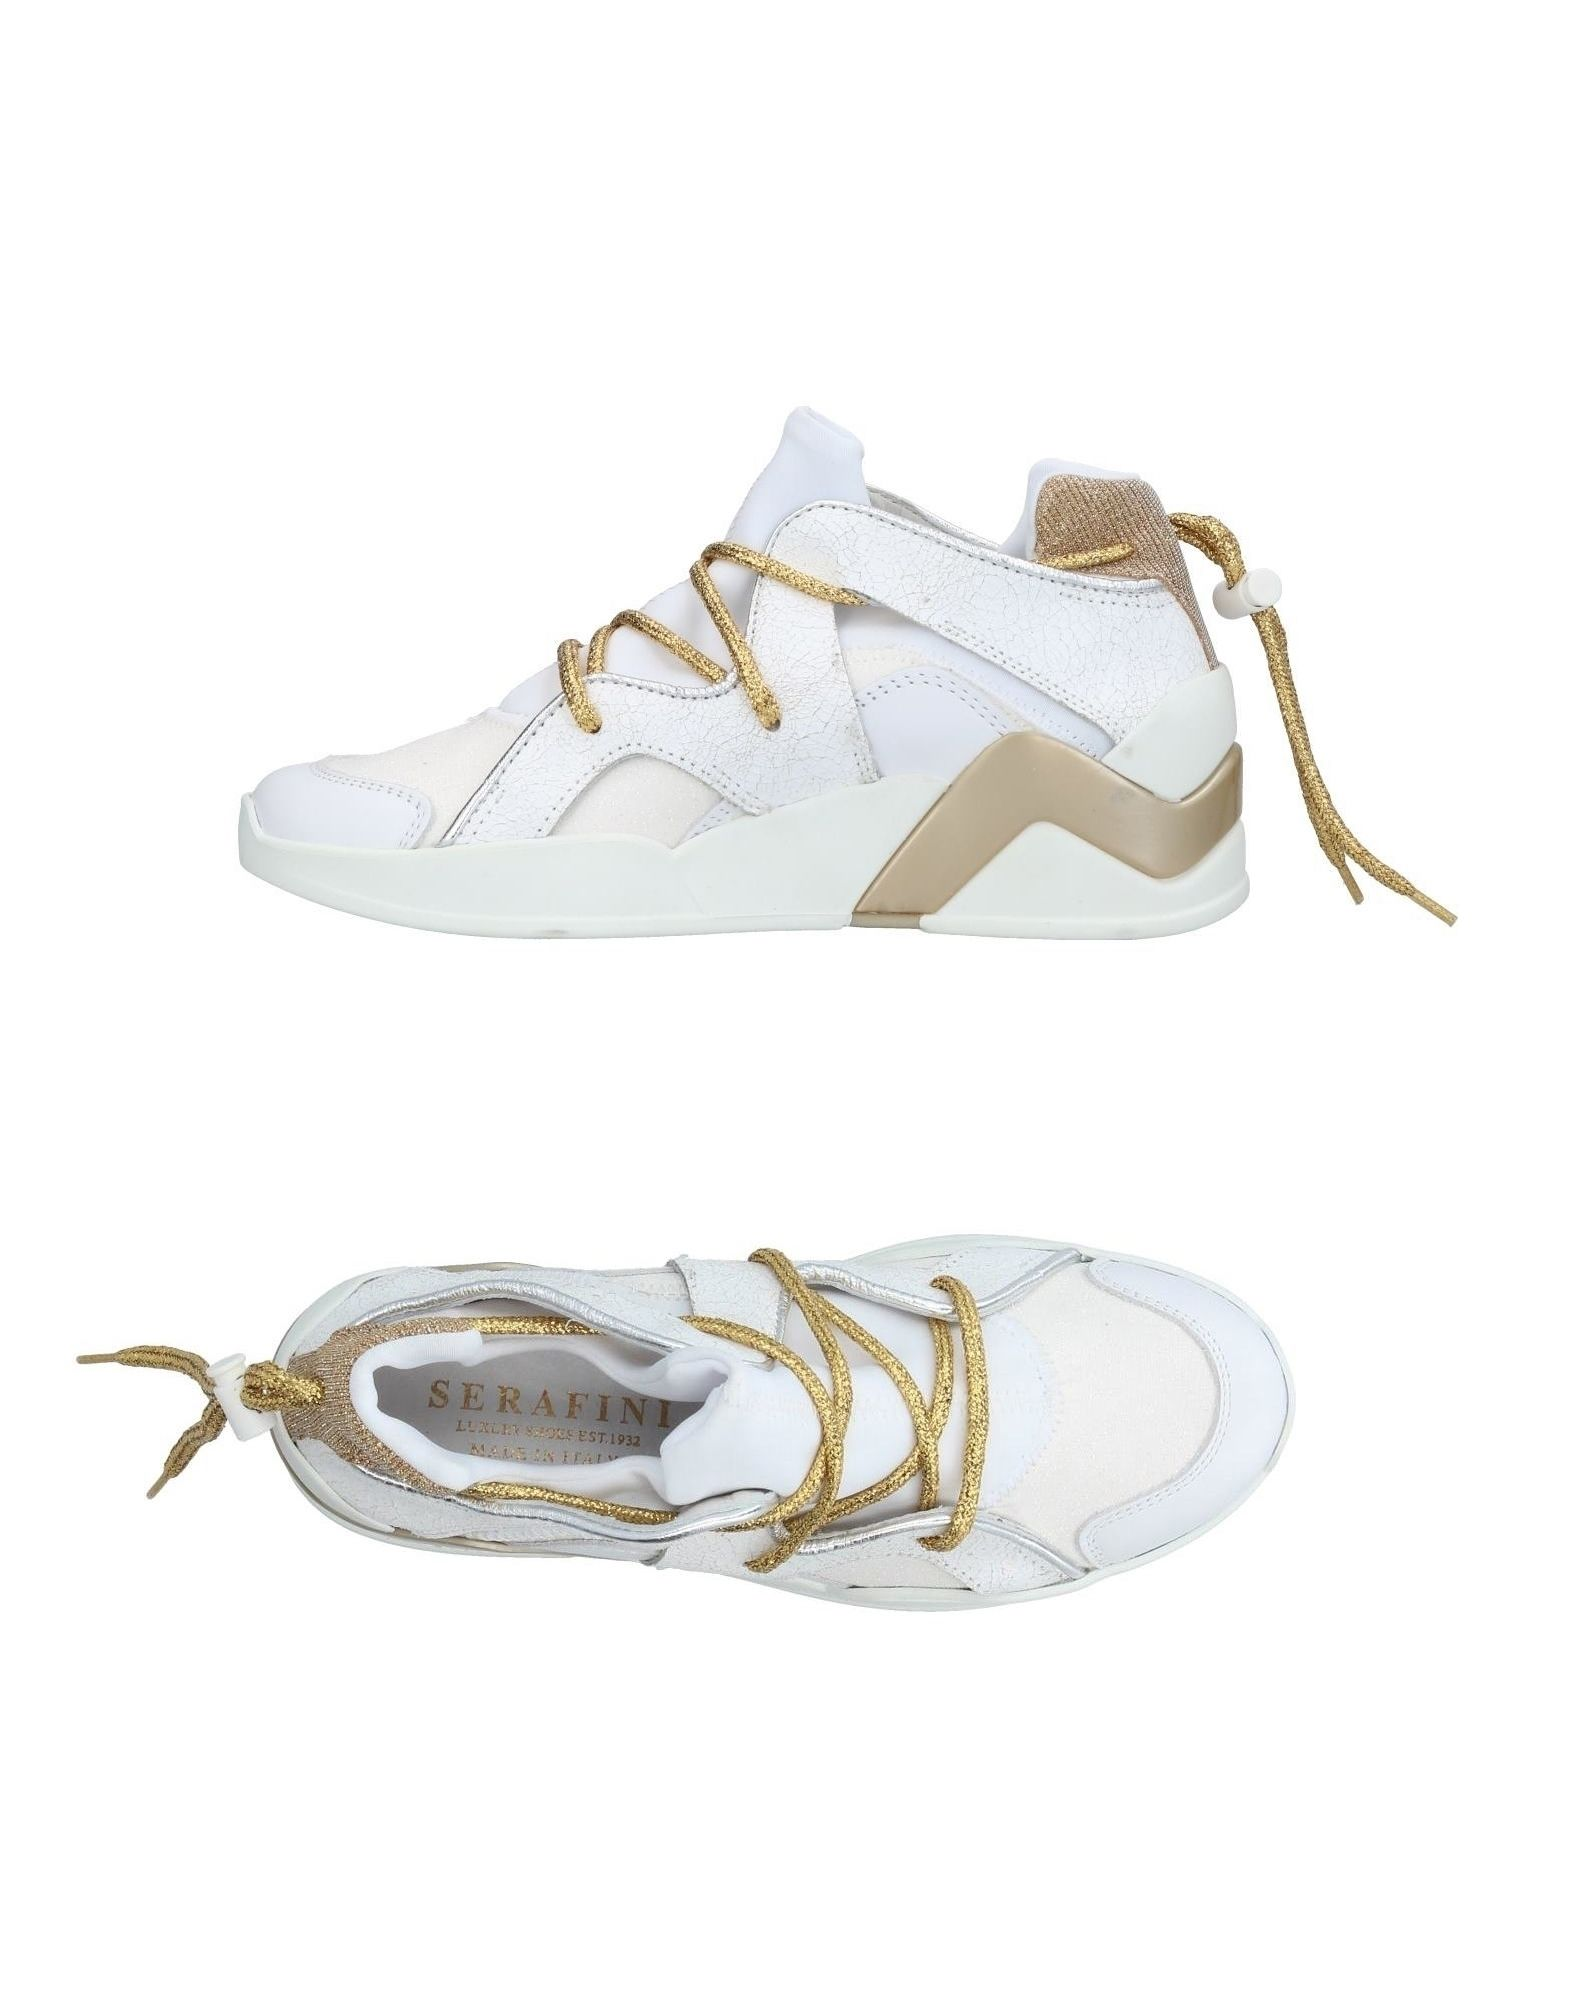 Sneakers Serafini Luxury Donna - 11377350WG